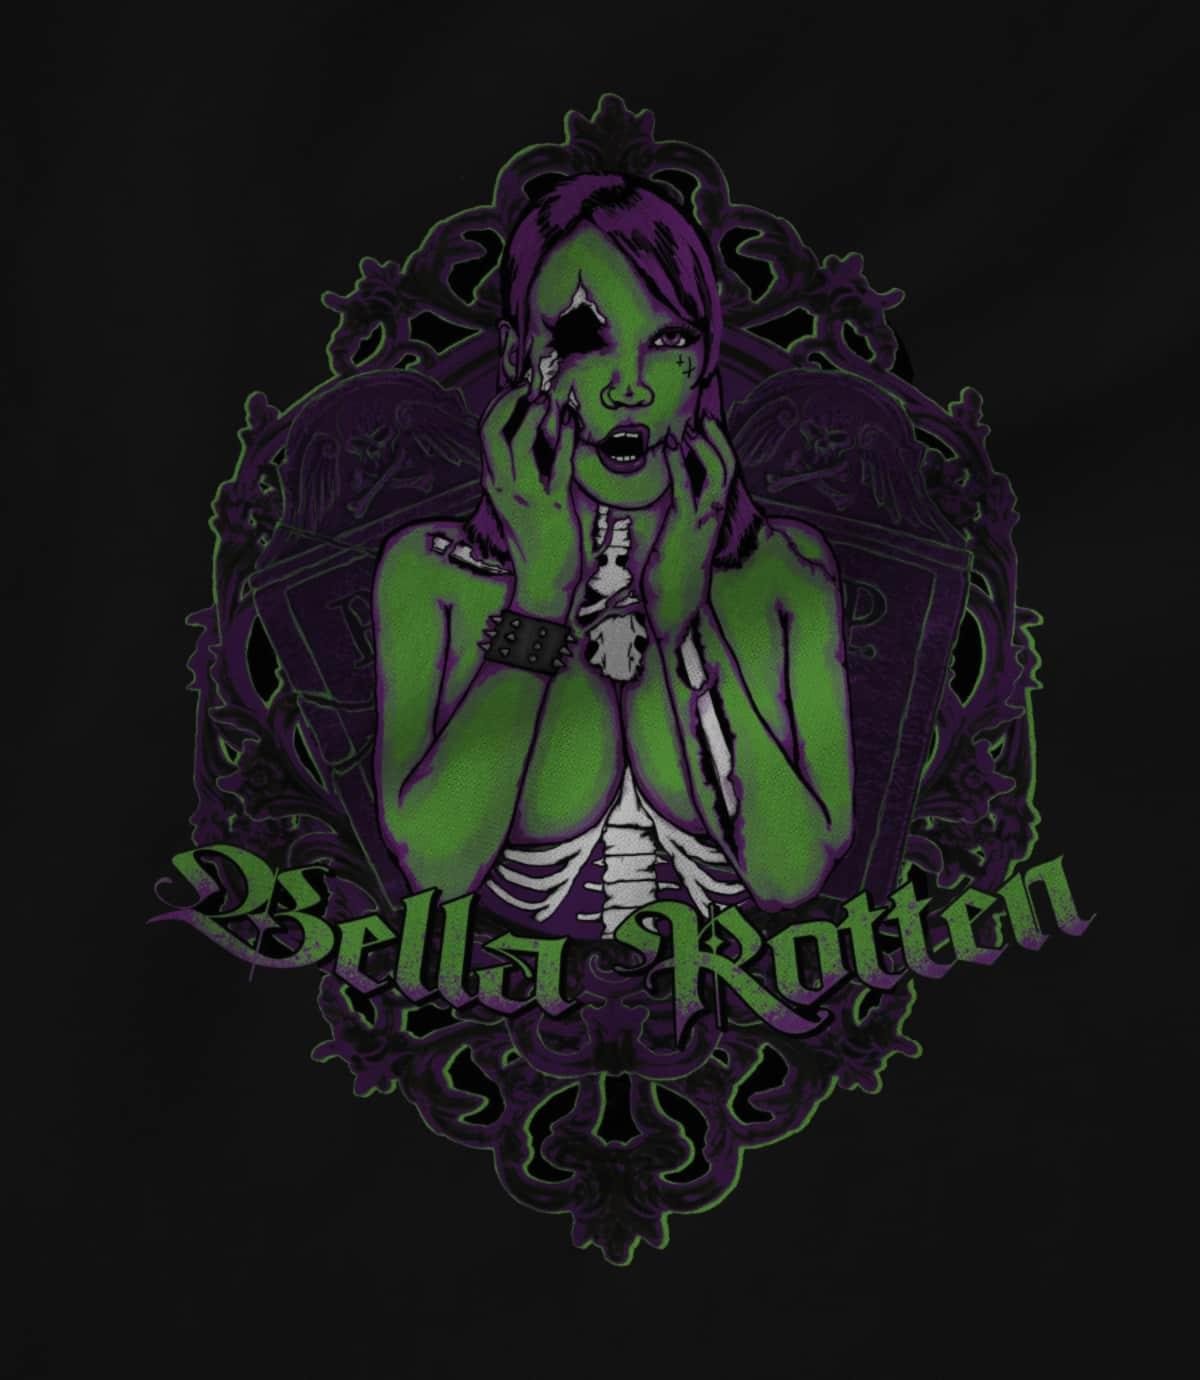 Bella Rotten